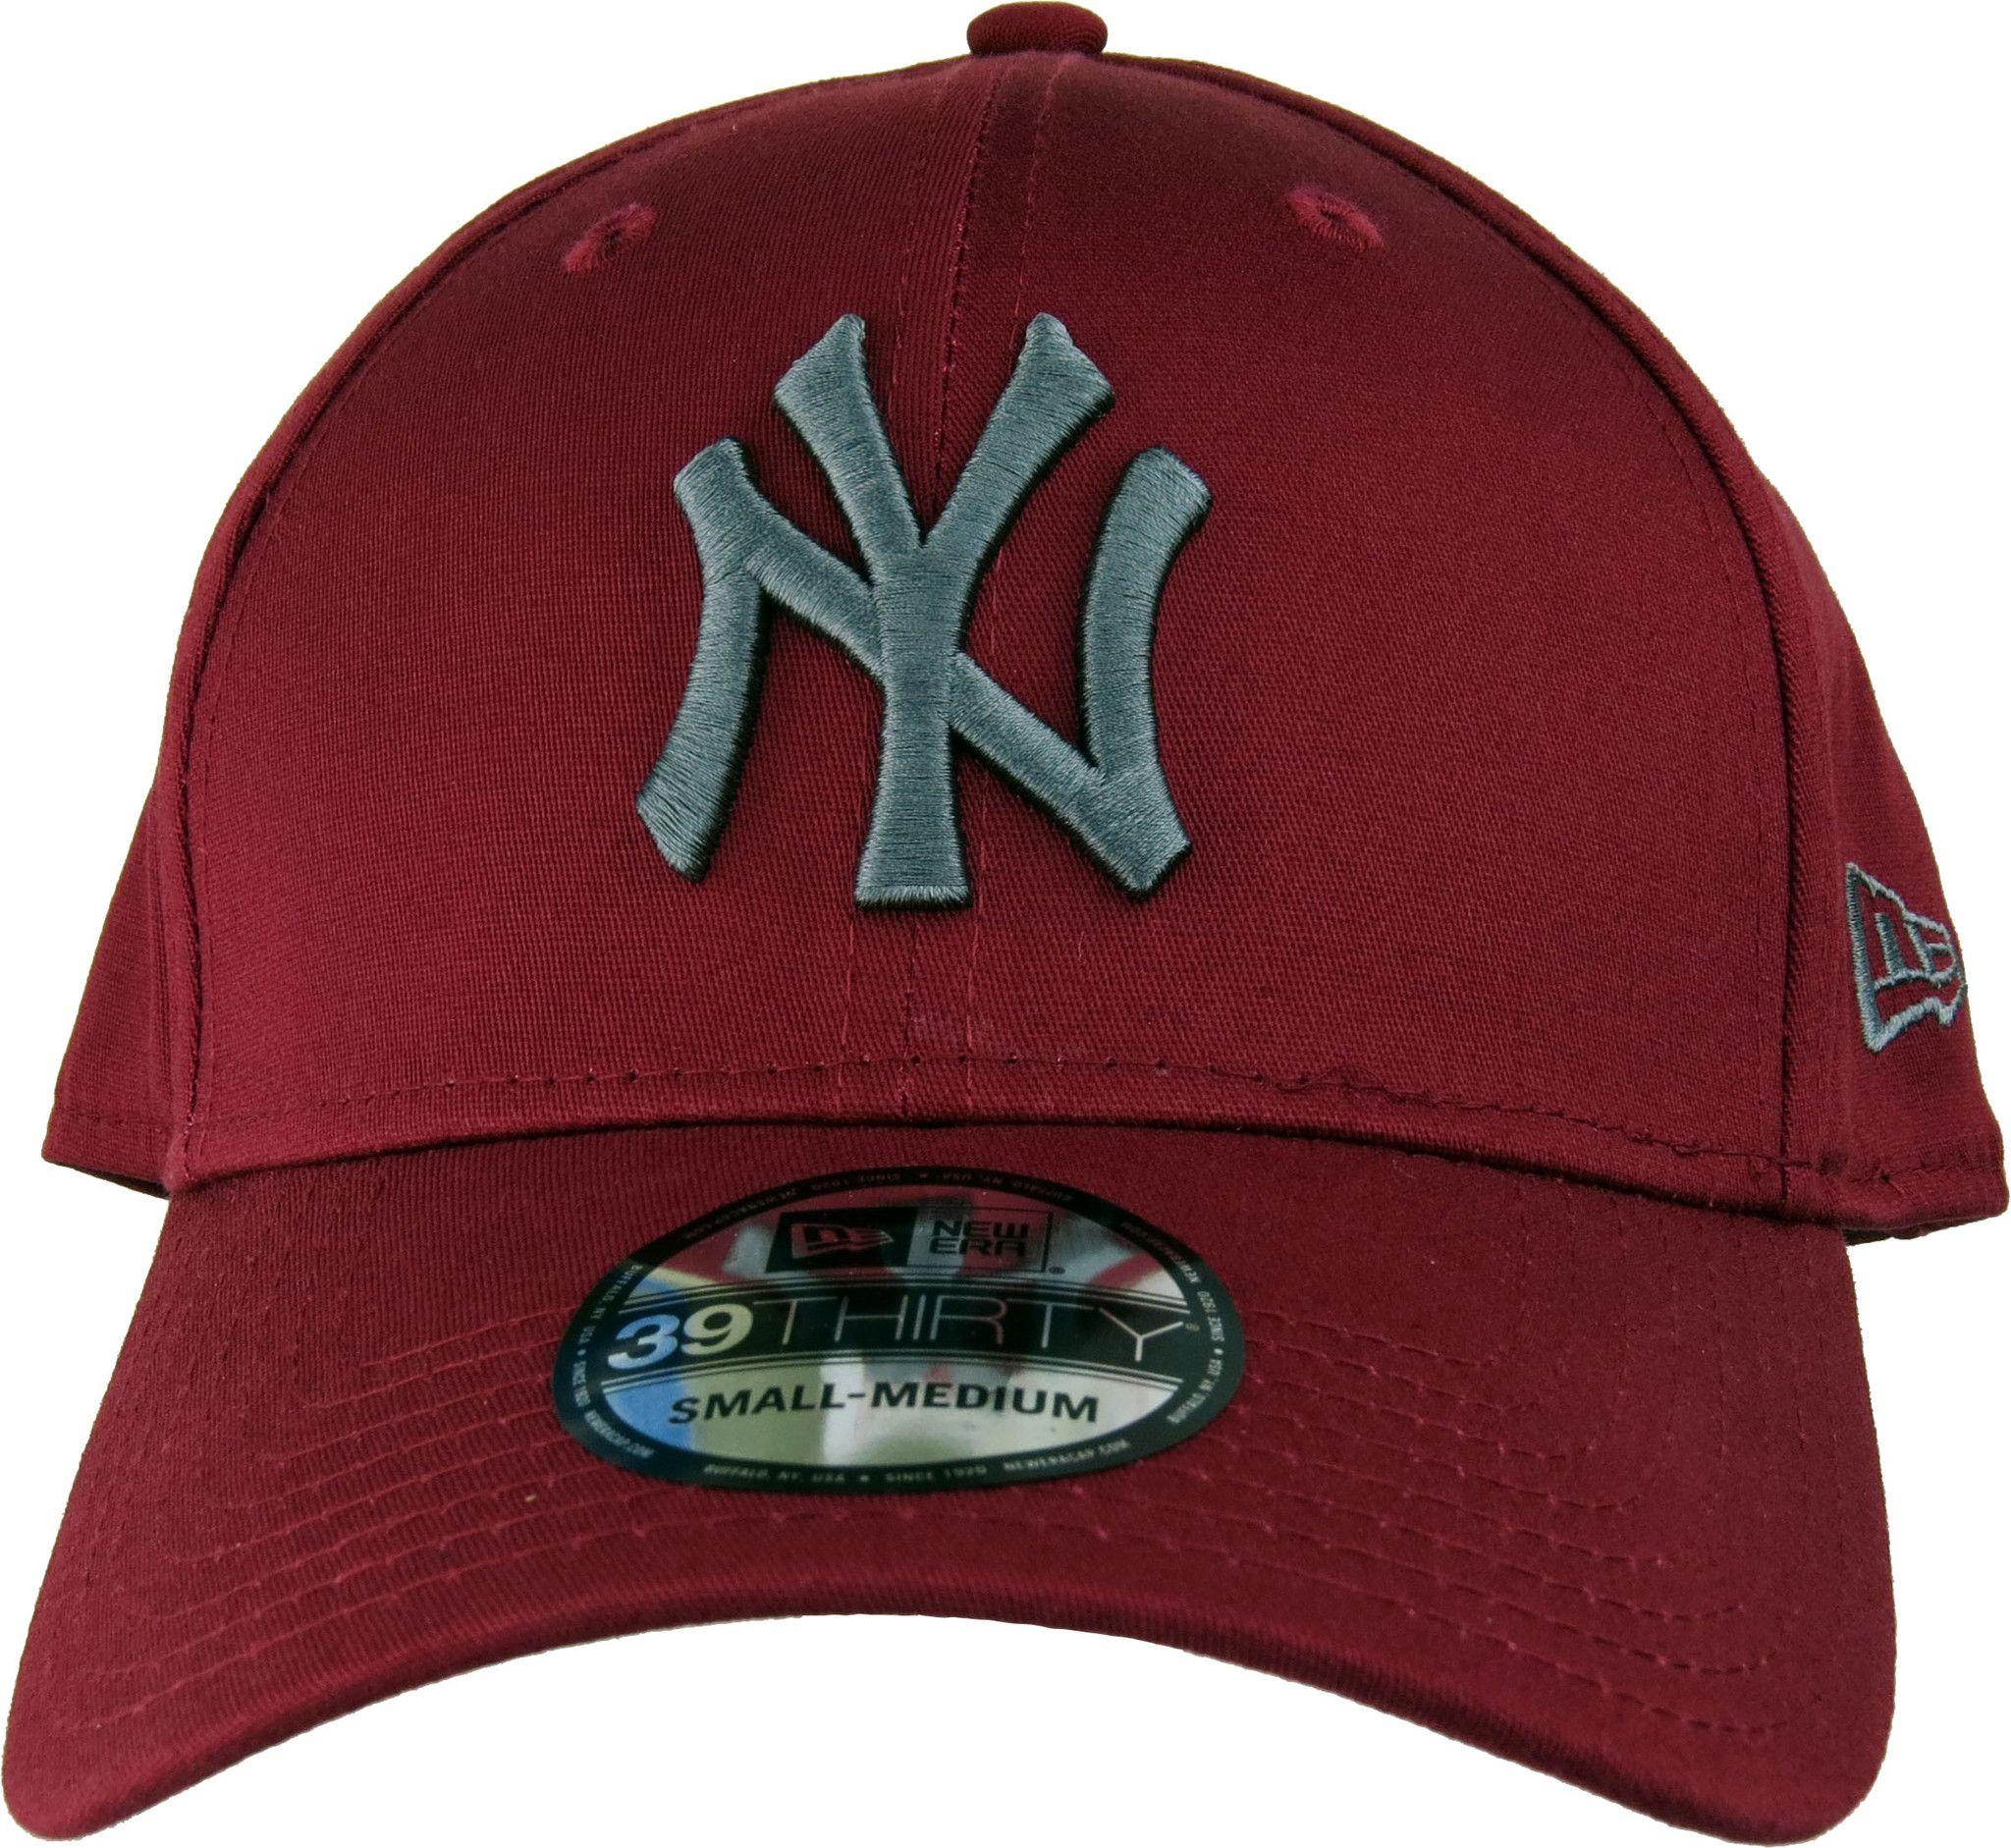 NY Yankees New Era 3930 League Essential Stretch Fit Baseball Cap -  Cardinal Graphitee - pumpheadgear 36ad0ca3601